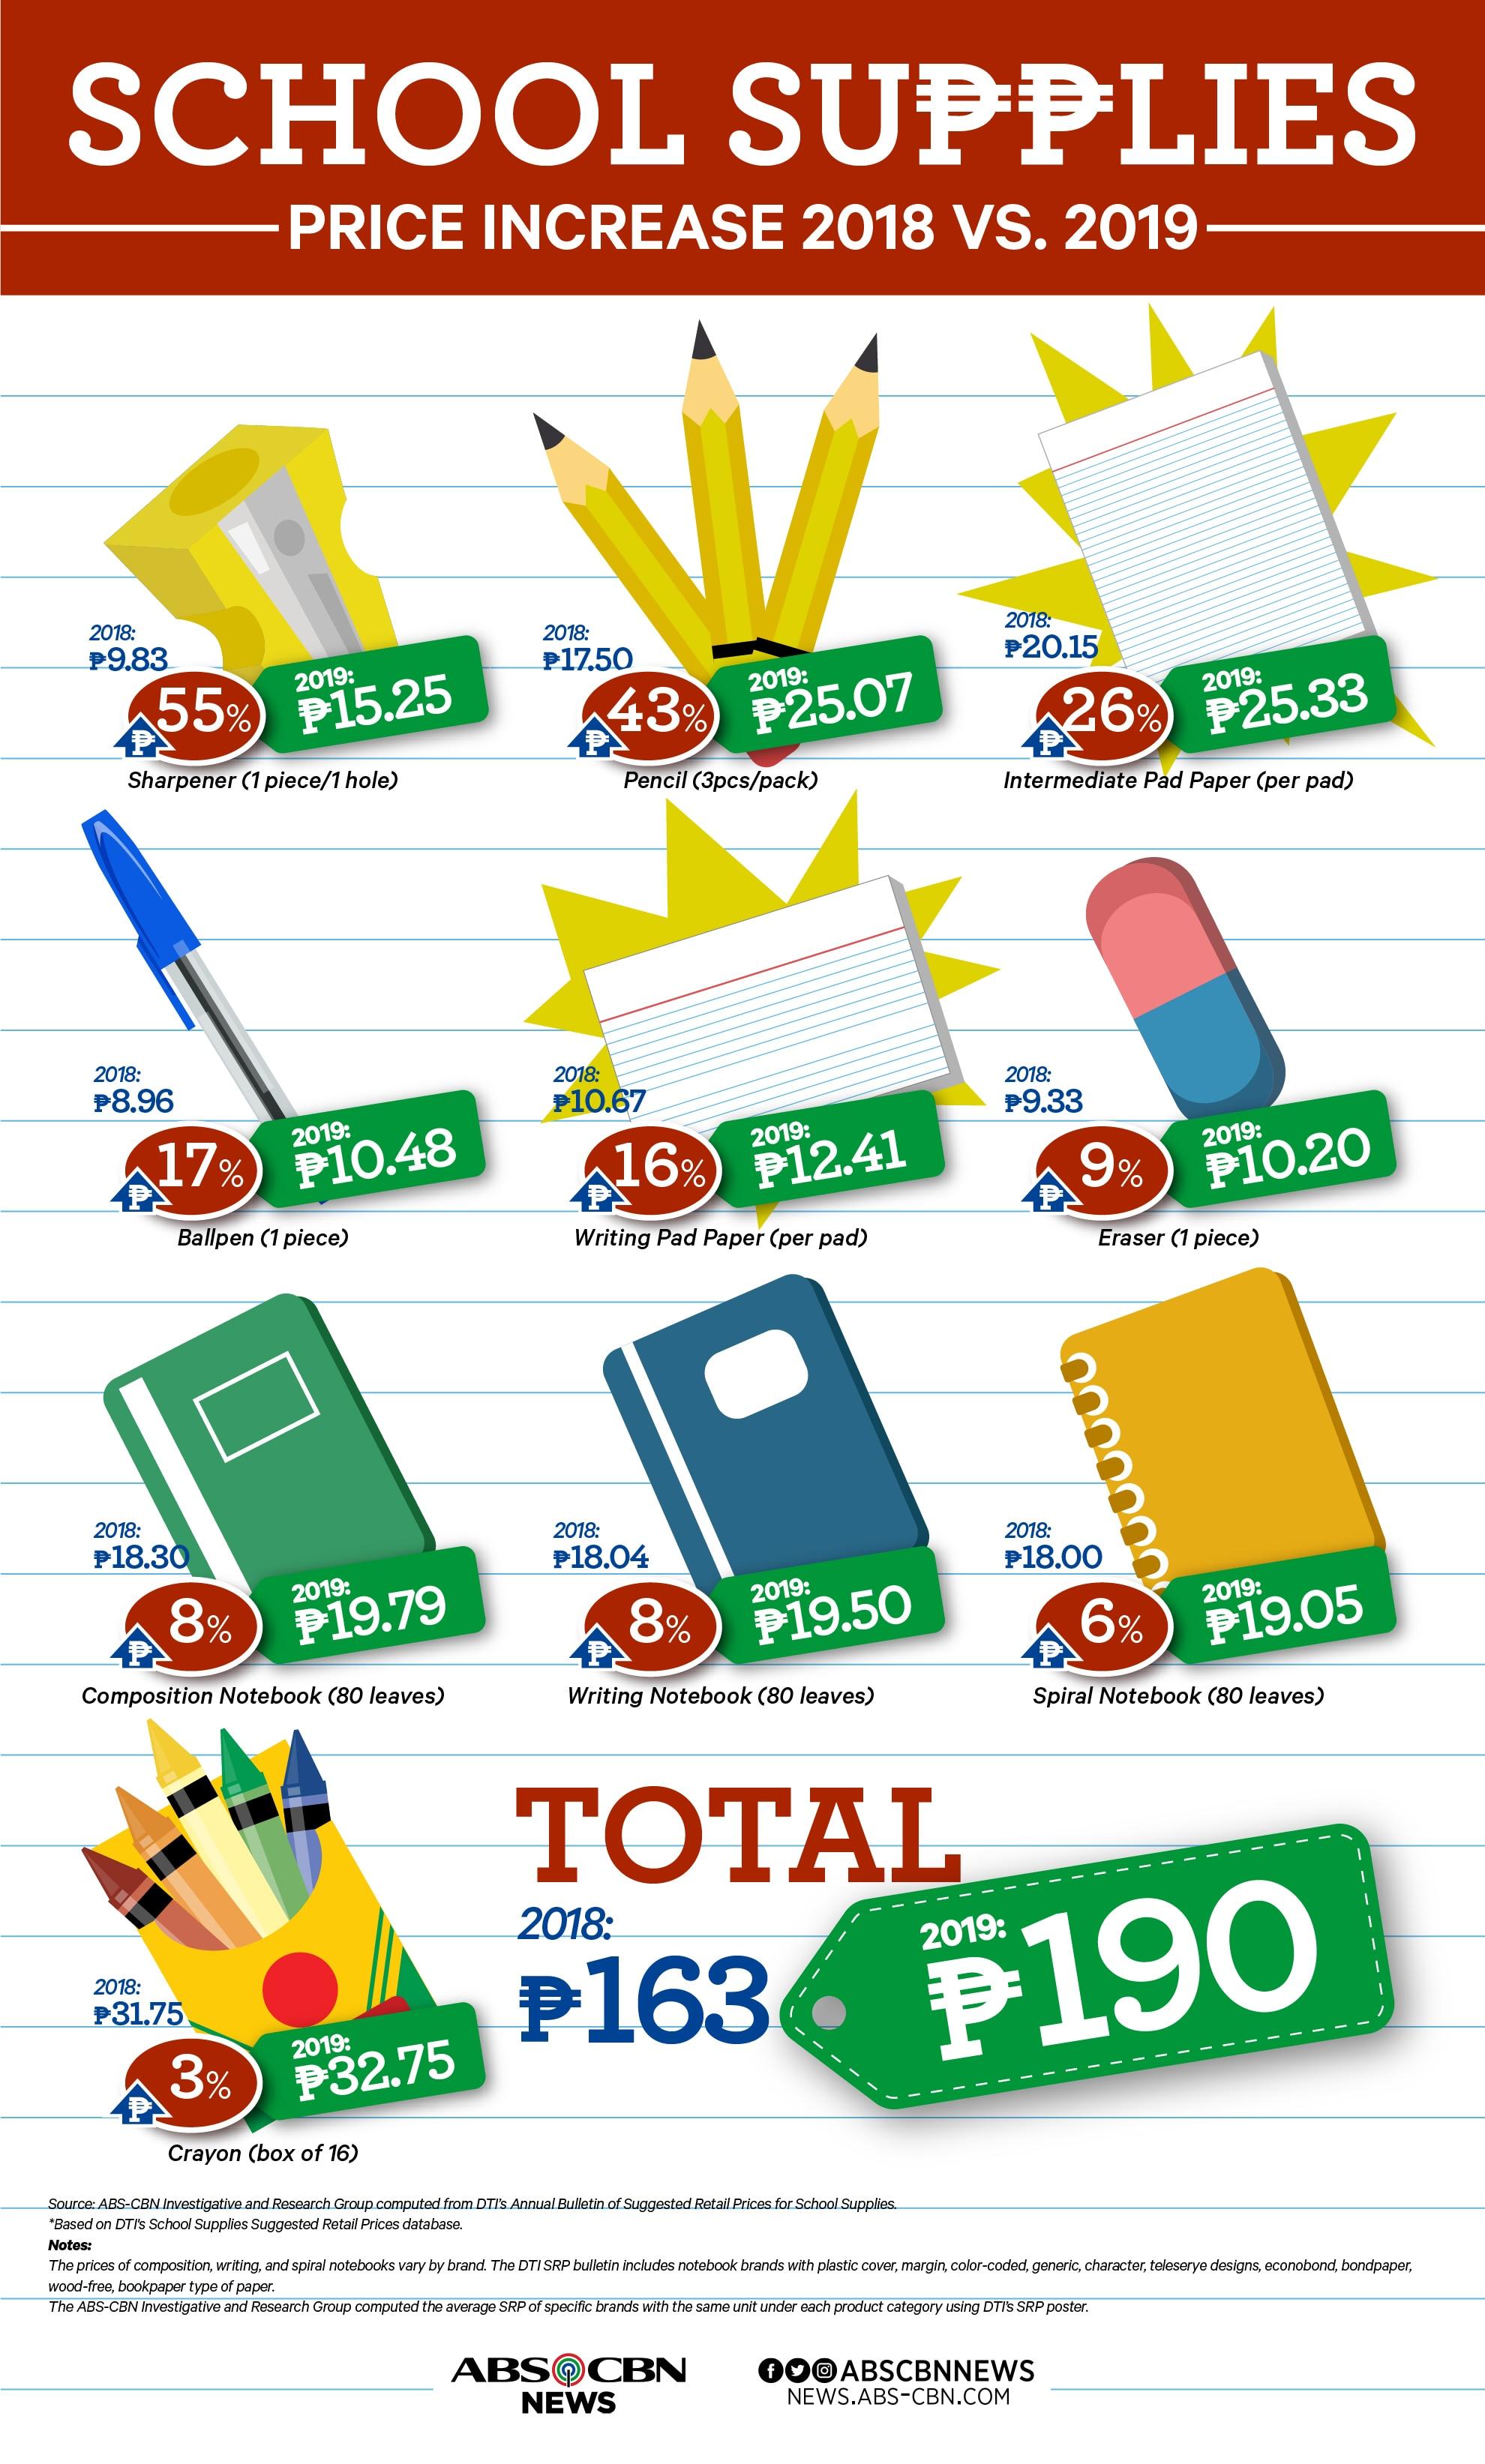 Prices of School Supplies: 2018 vs 2019 1